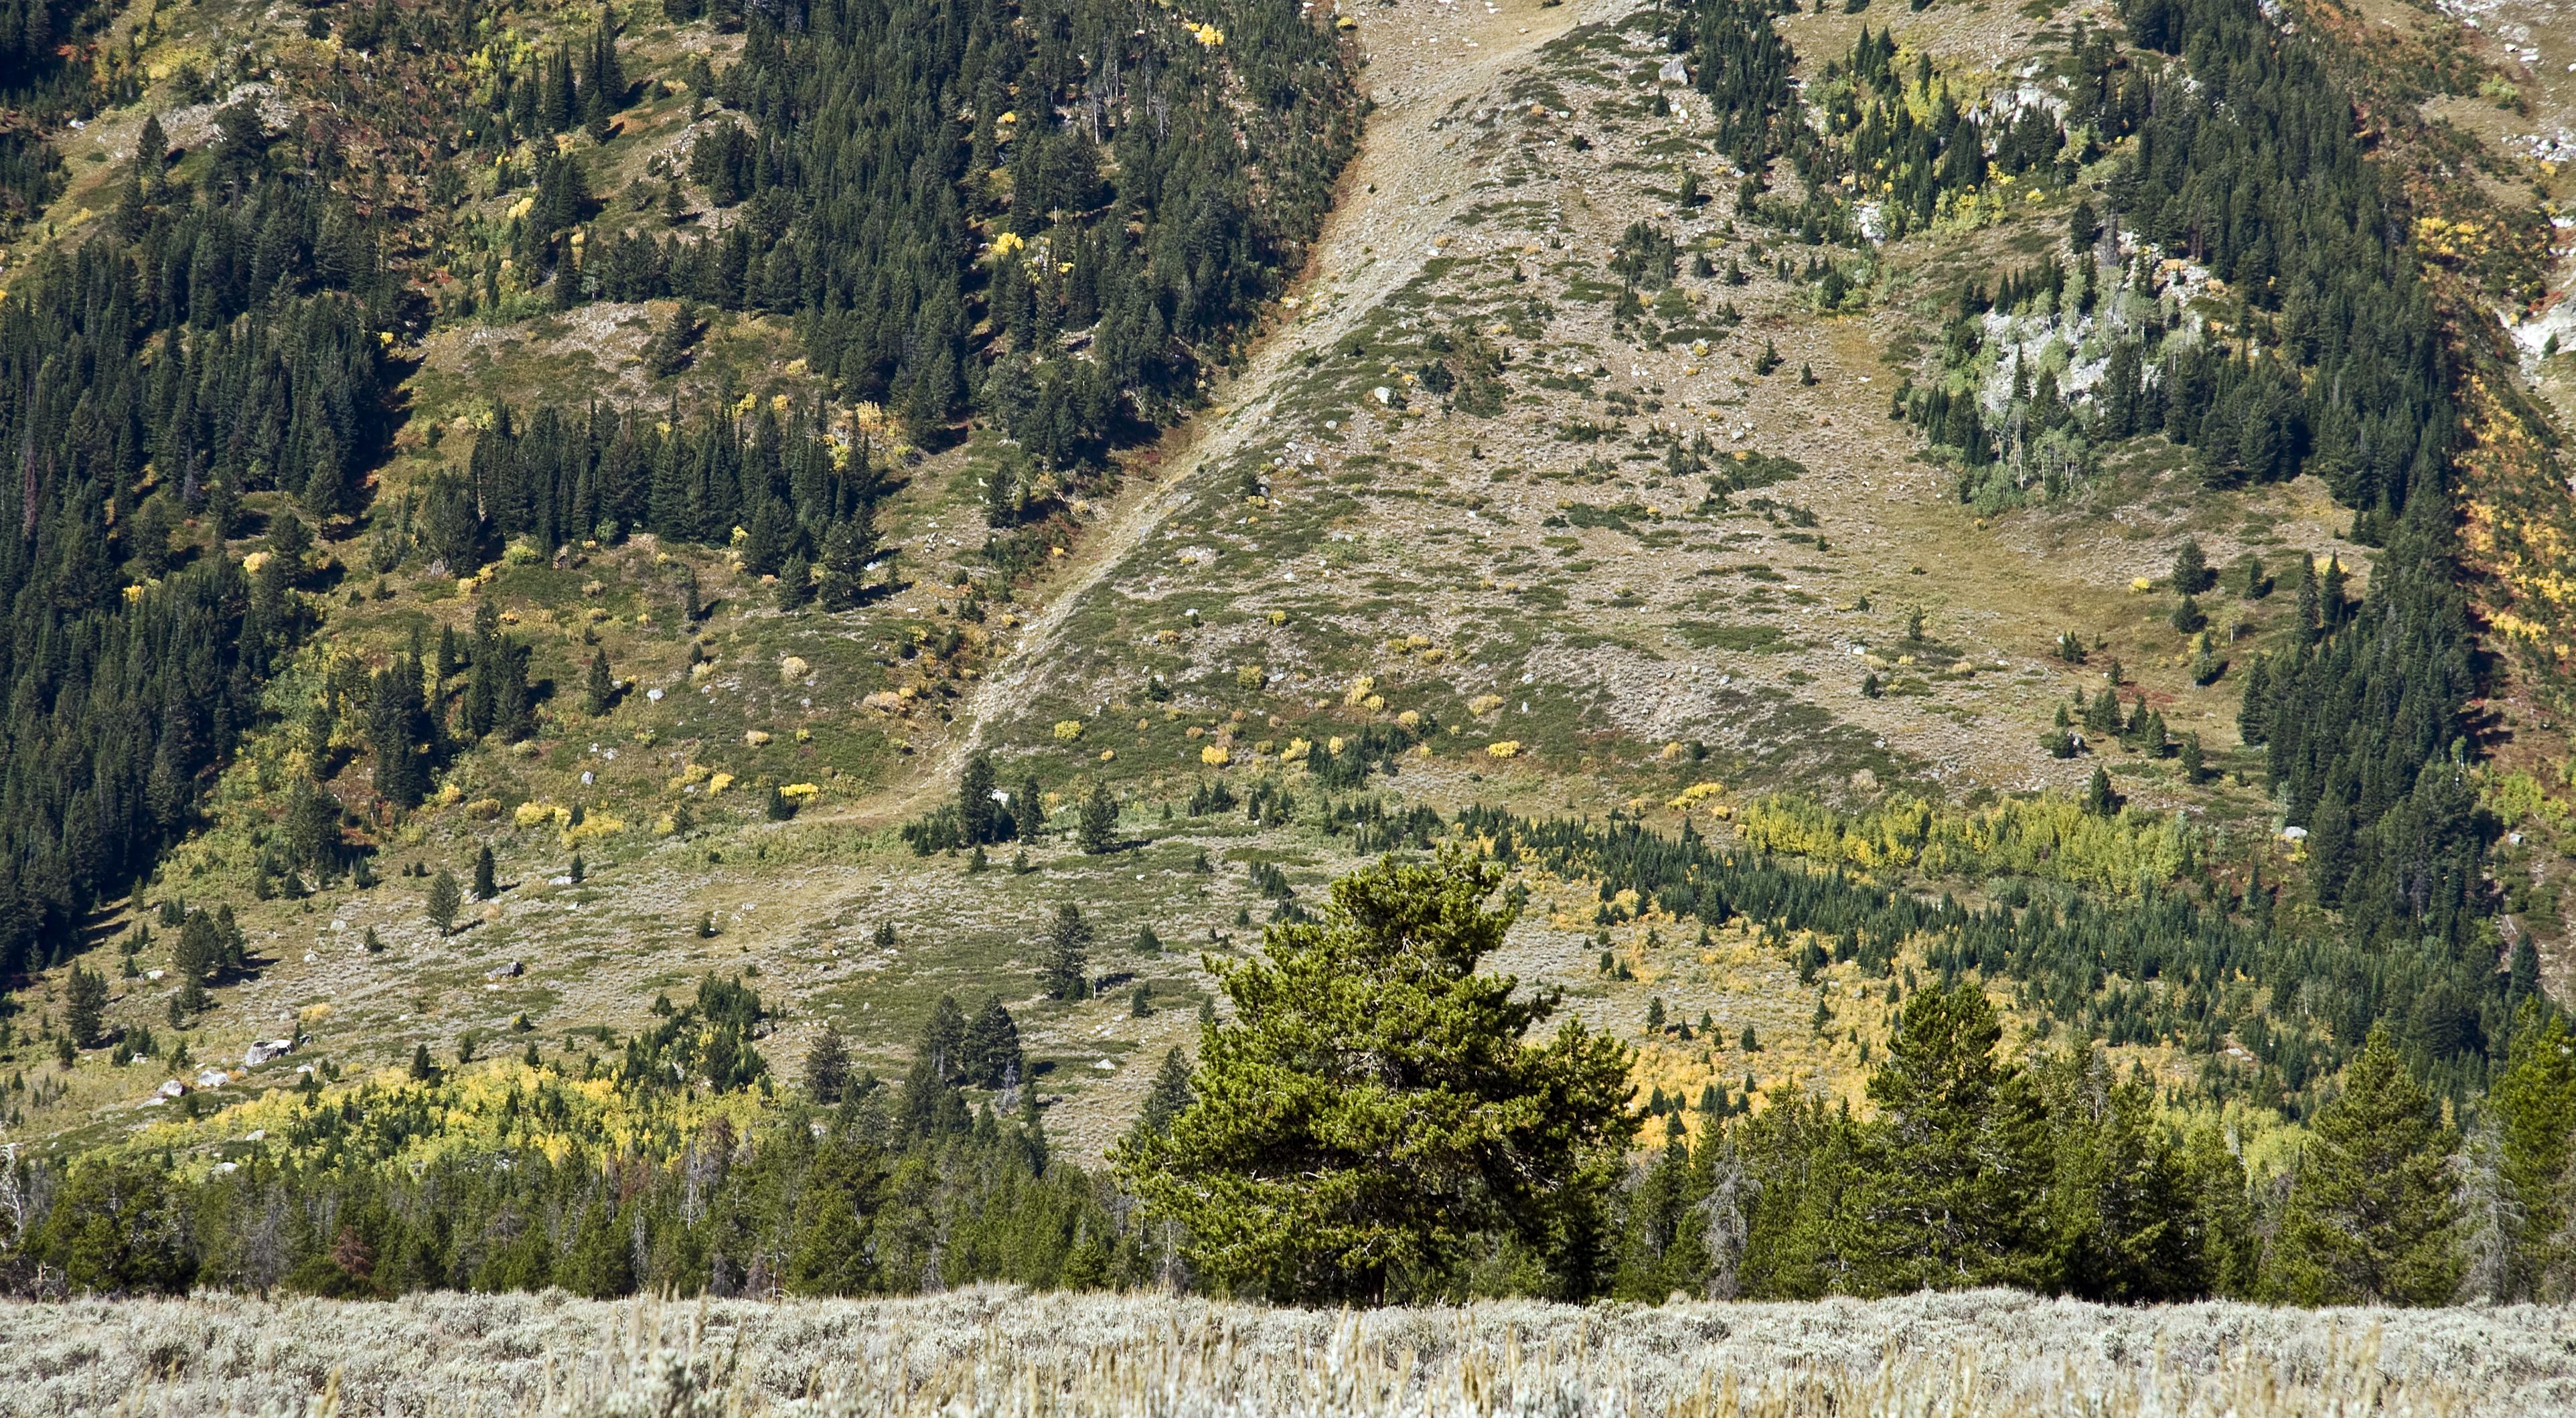 Jackson Hole Earthquake Jackson Hole[edit